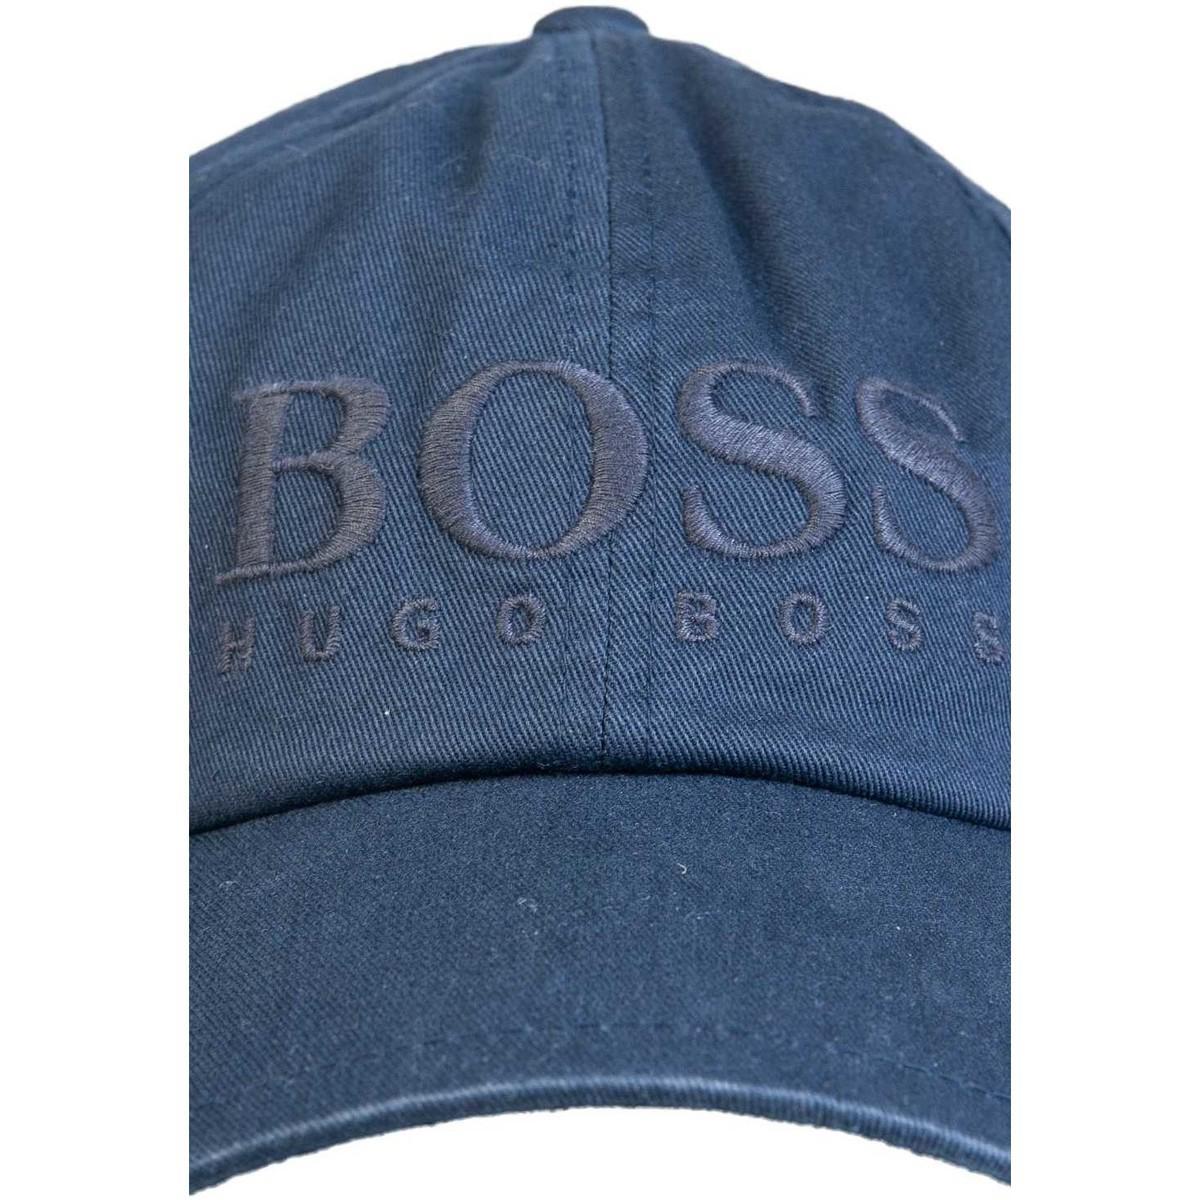 BOSS - Baseball Cap Model Quot fritz 50378282 Quot  Men s Cap In Blue for.  View fullscreen 340e1bc9900b